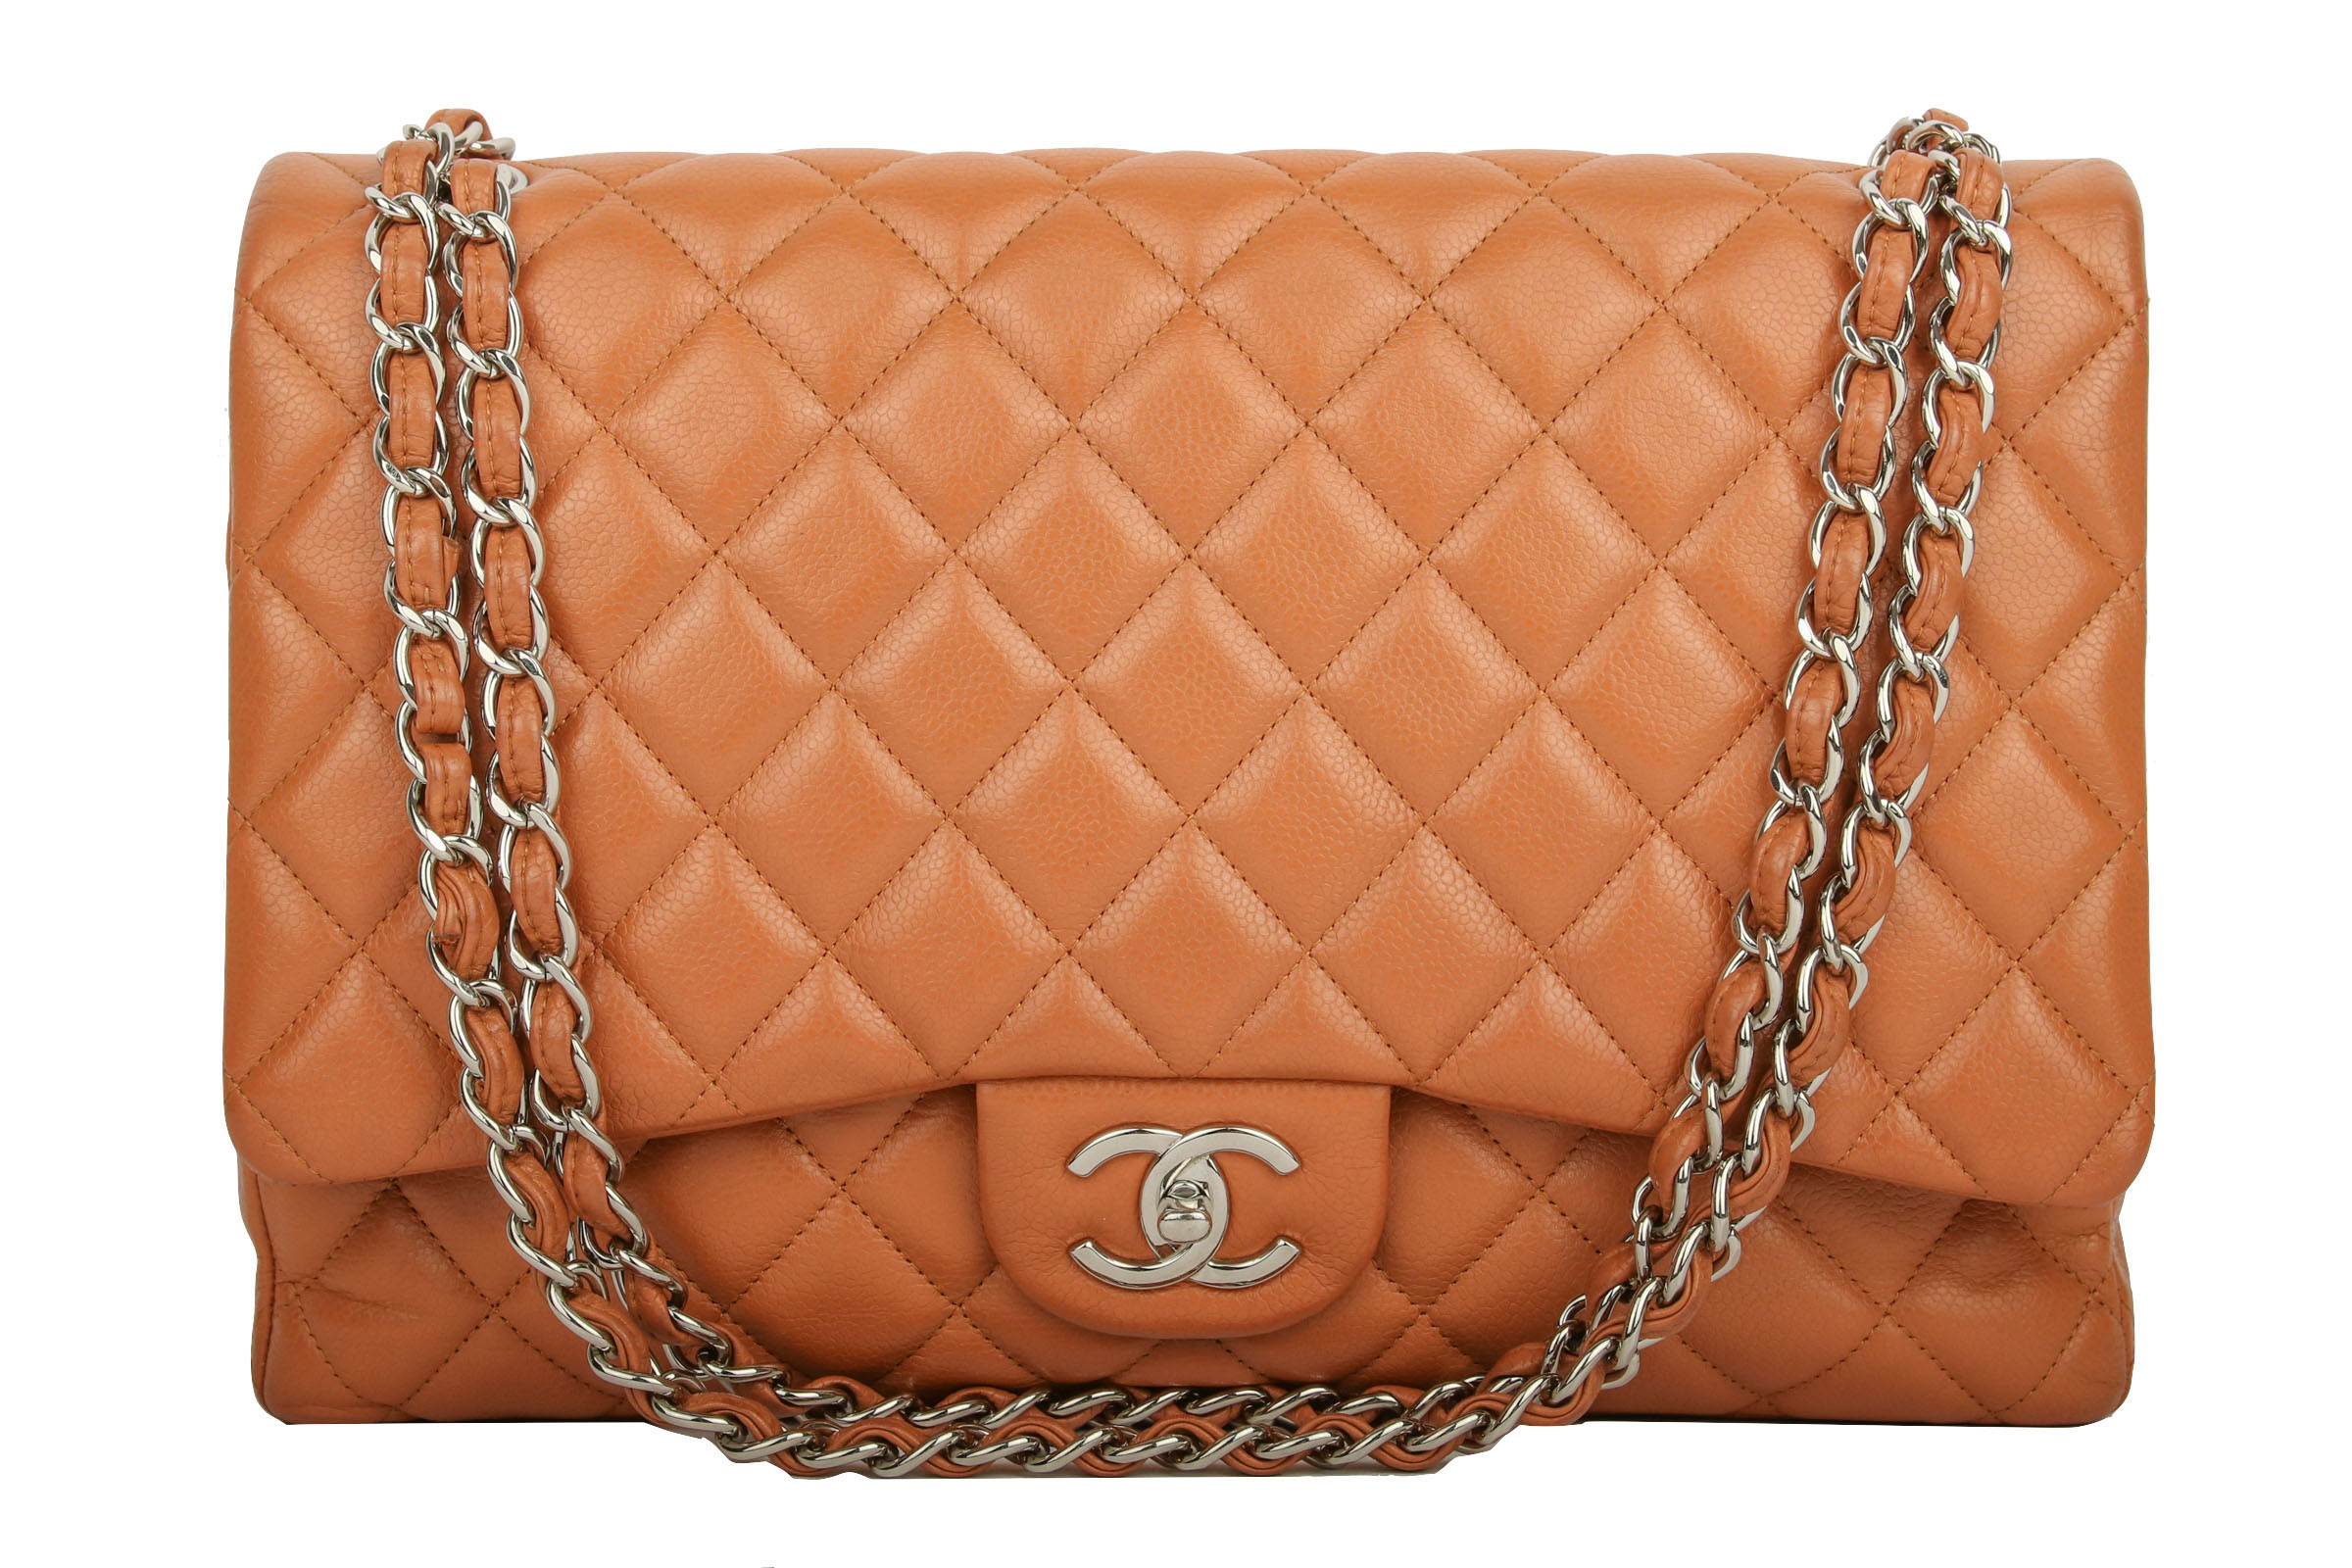 ca16c15d93655 Second Hand Designer-Handtaschen & -Accessoires | Luxussachen.com ...